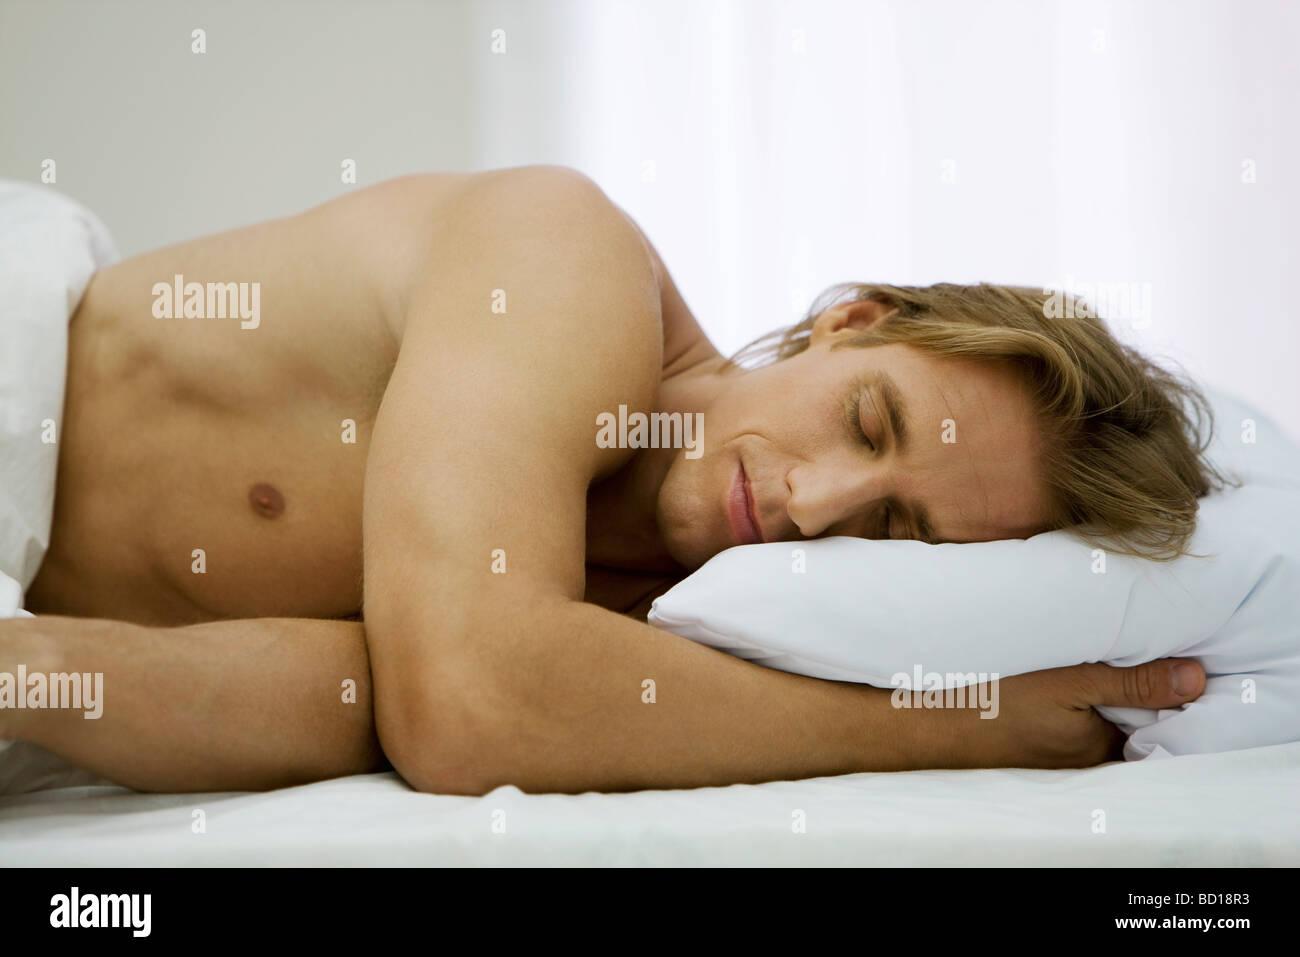 Man sleeping in bed - Stock Image